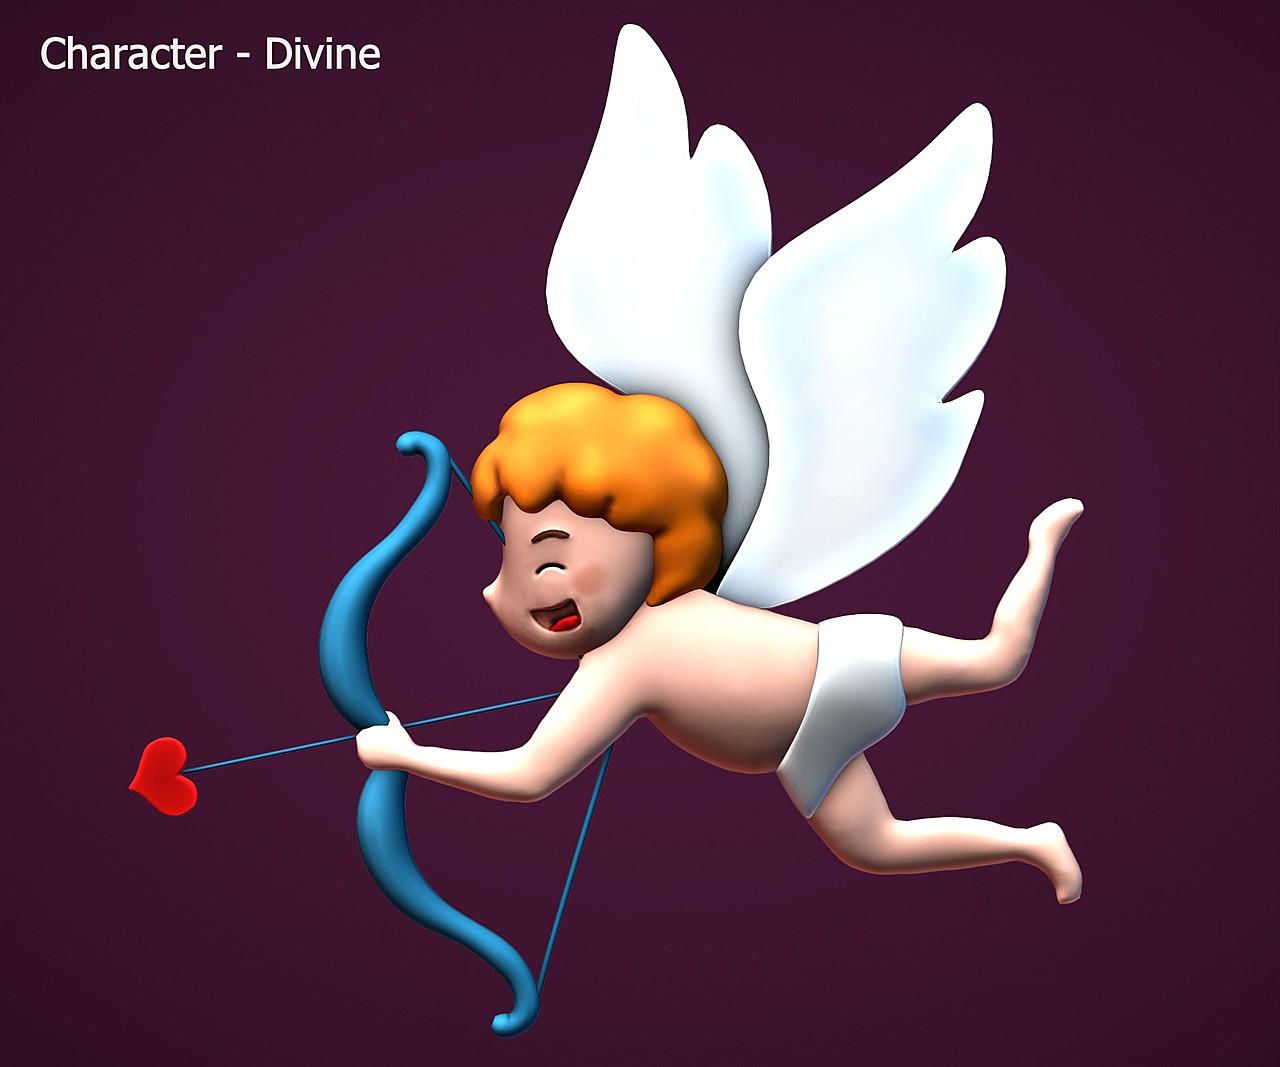 Cupid - SculptJanuary2020, day 31